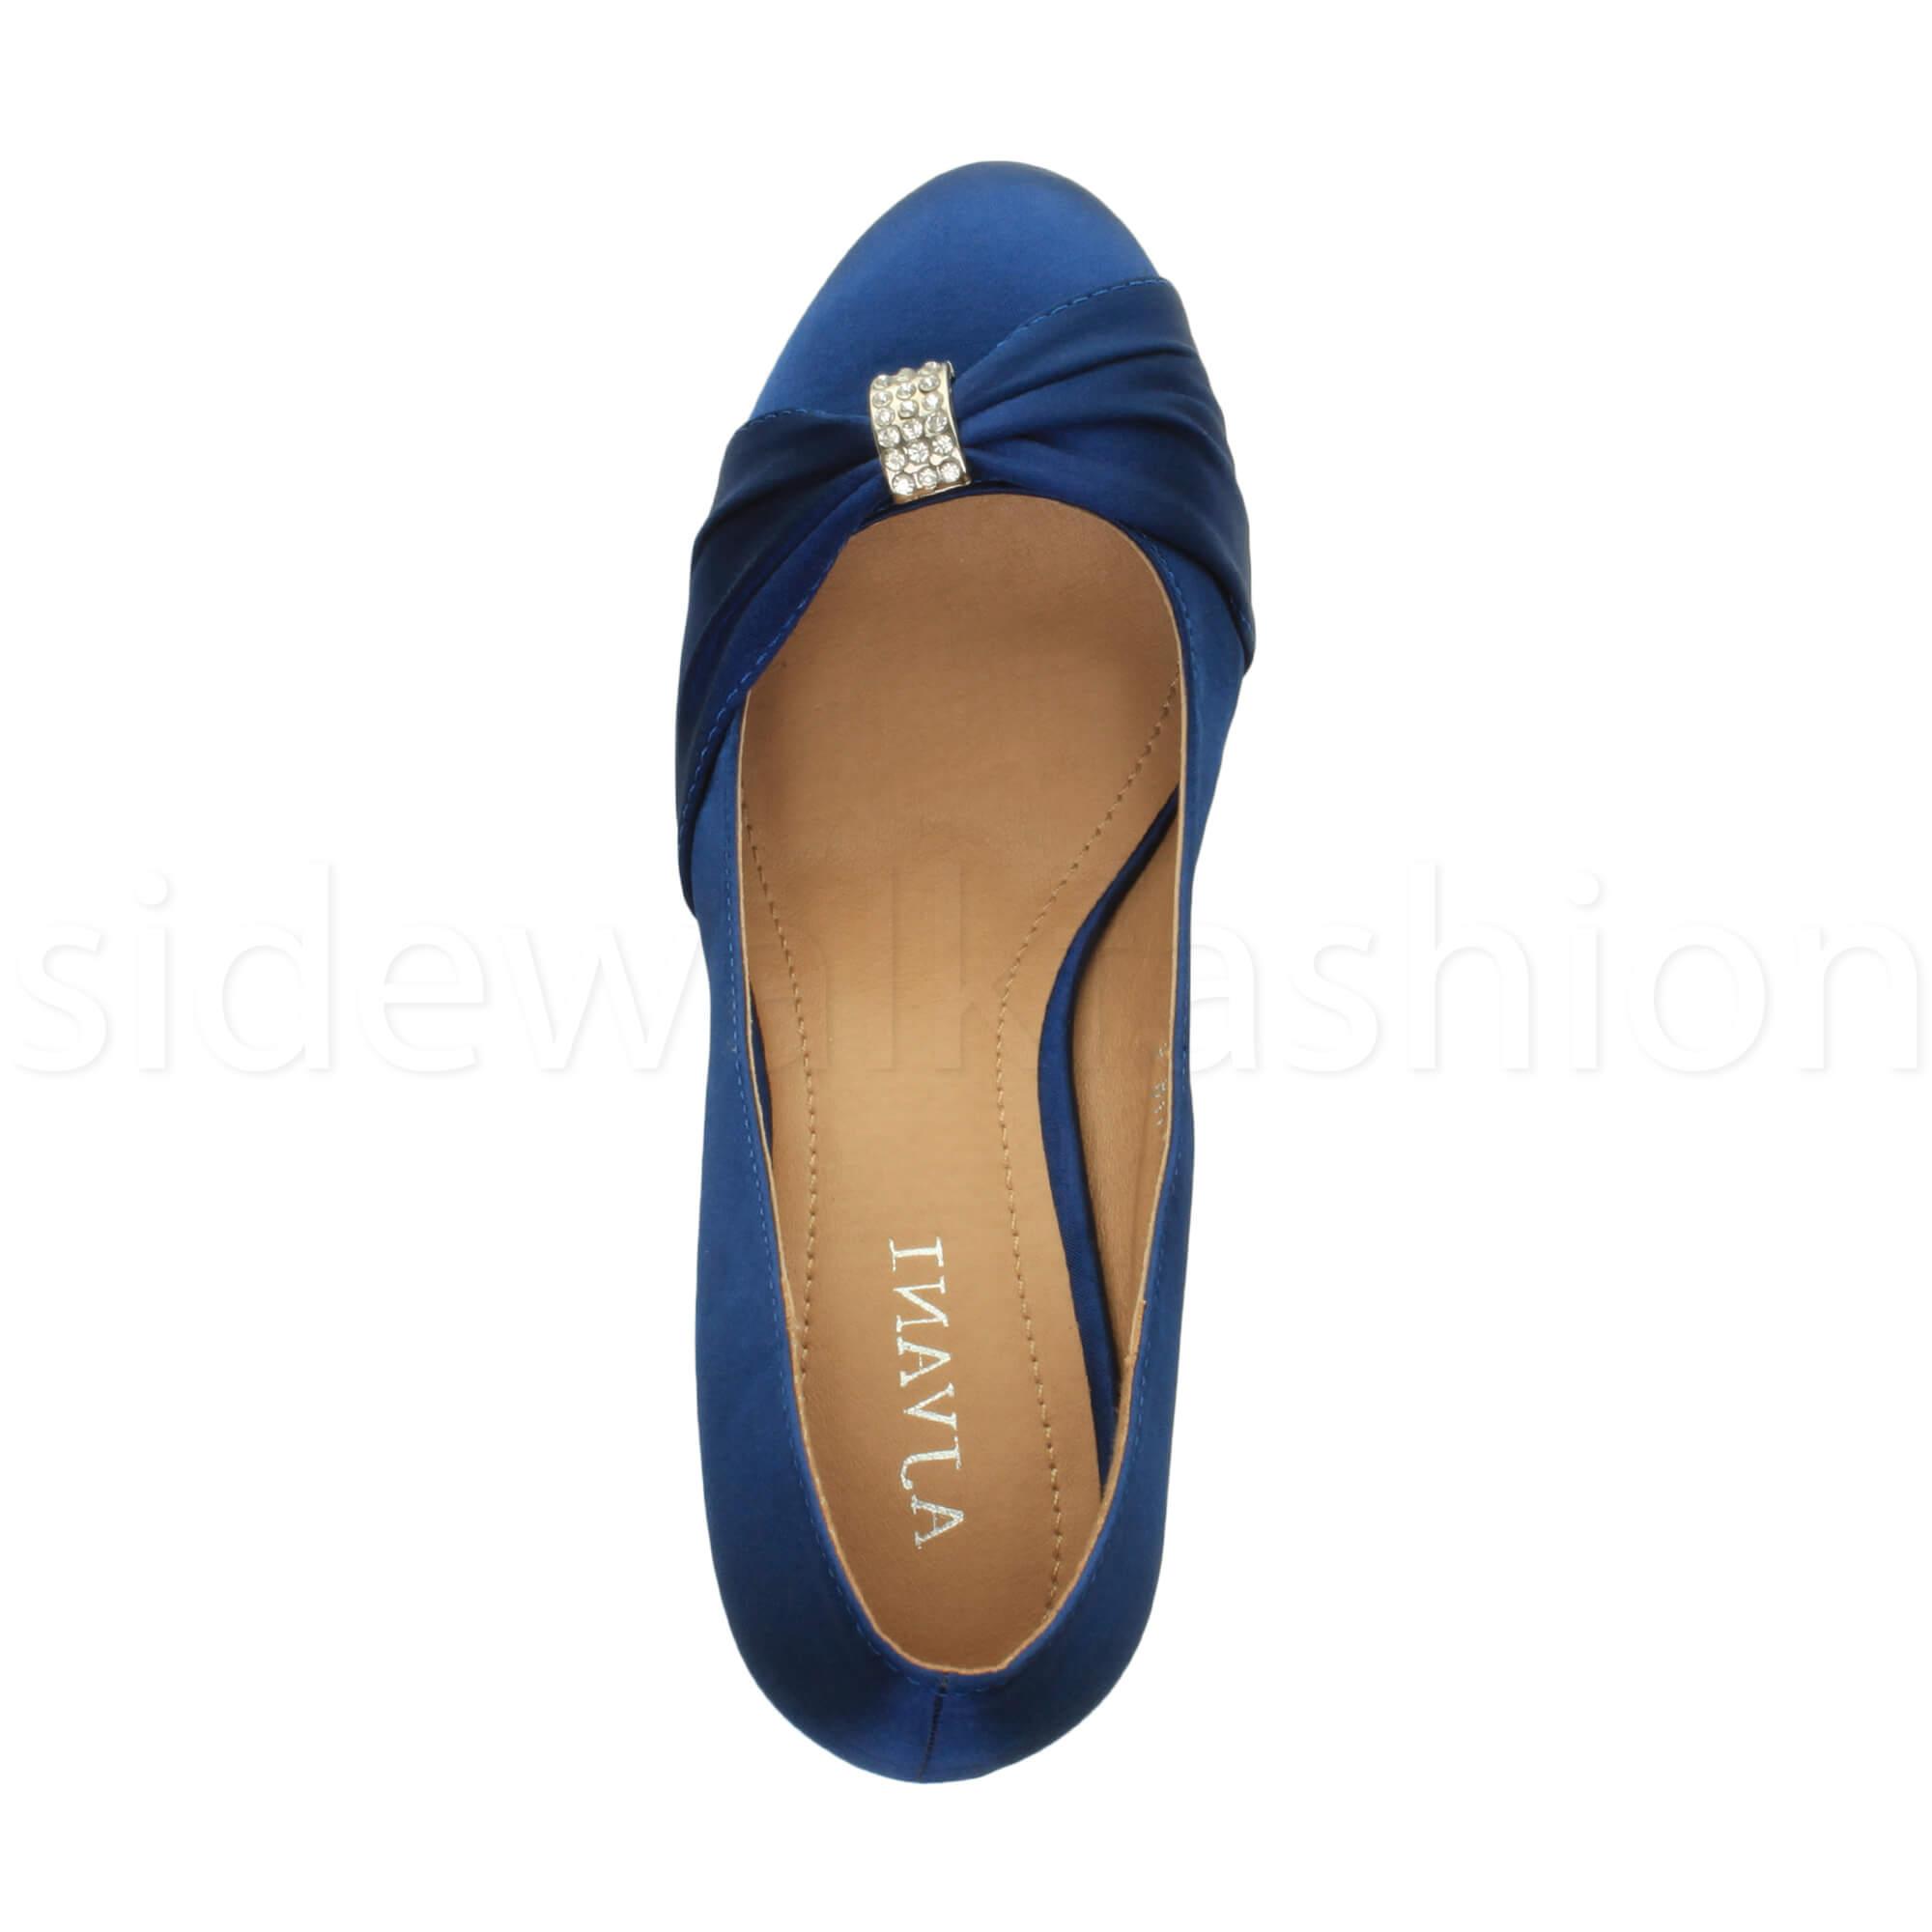 Womens-ladies-low-mid-heel-diamante-party-smart-evening-court-shoes-size thumbnail 56